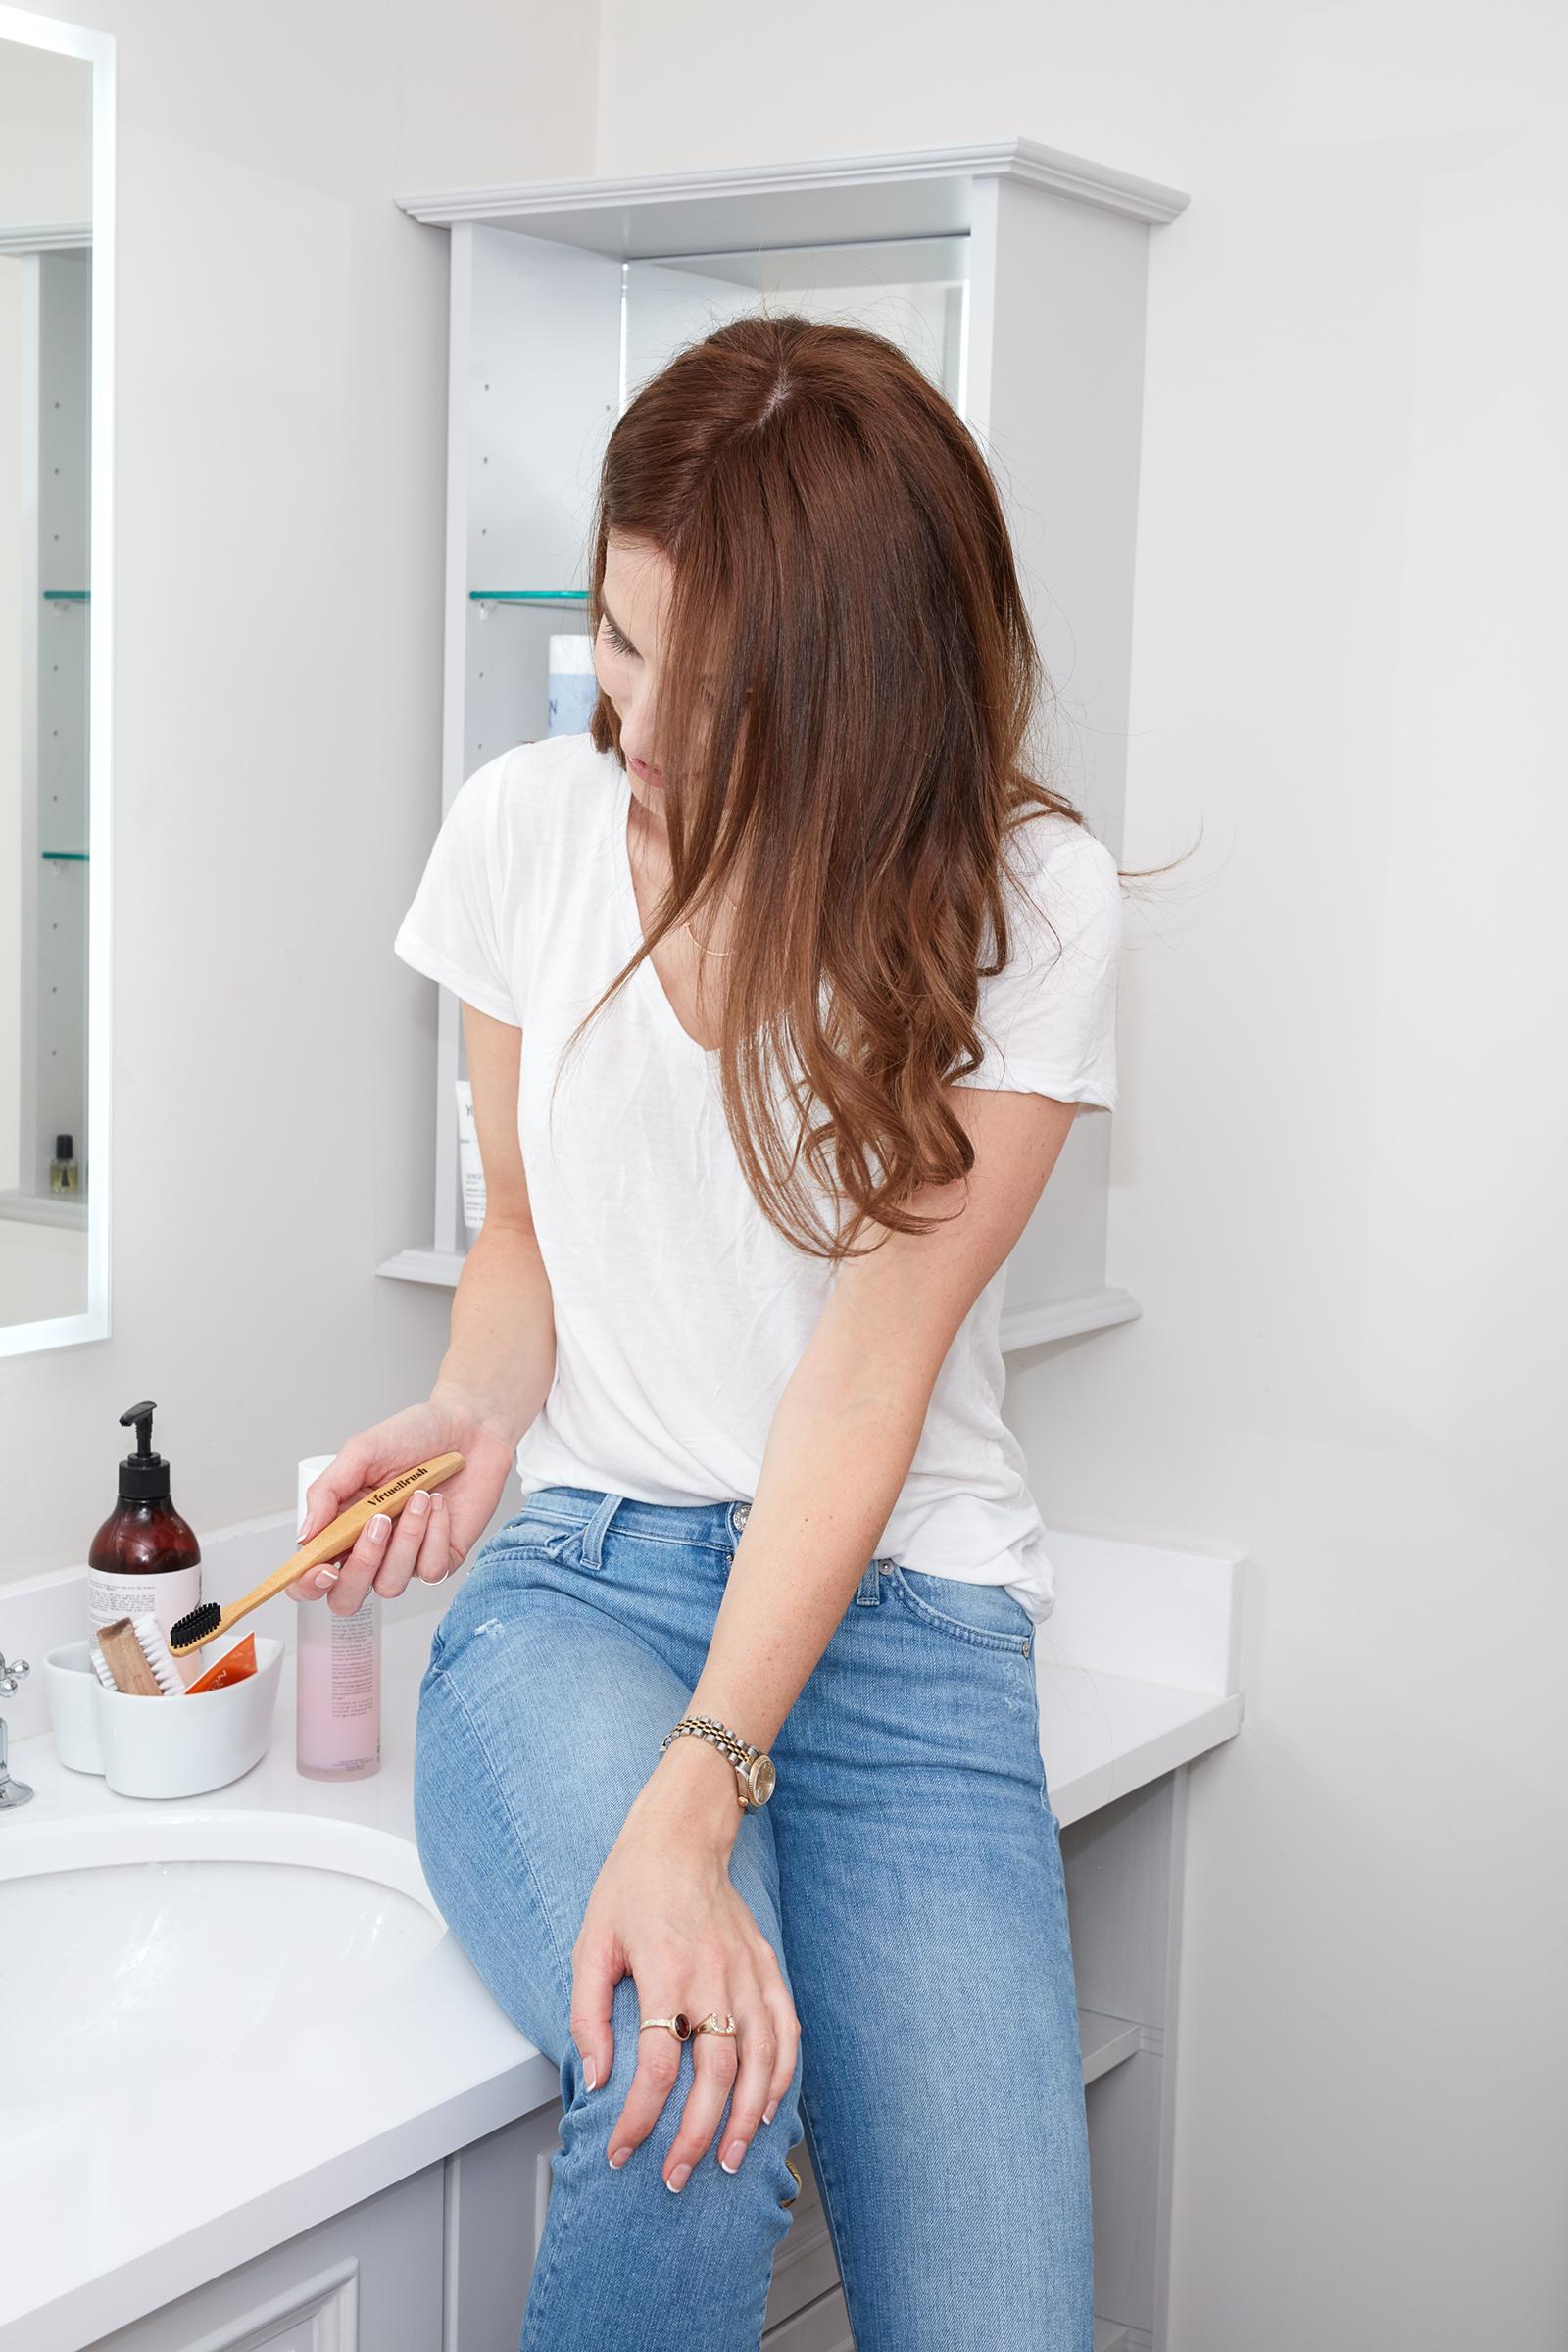 Bamboo Virtue Brush,Bamboo toothbrush, Holistic dentist tips,